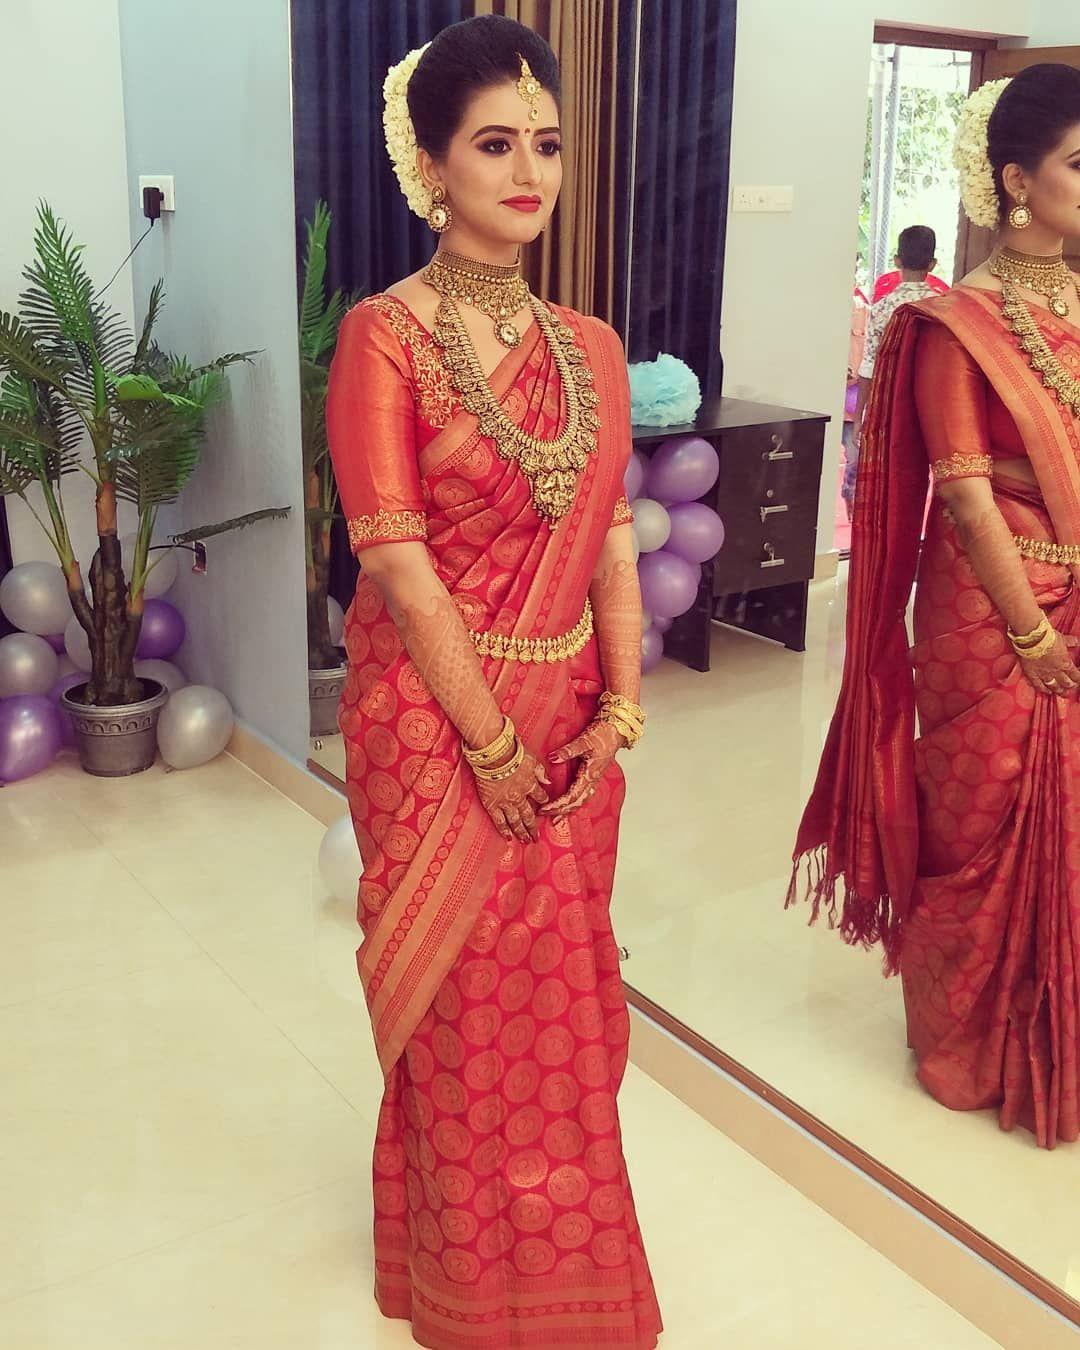 Kerala Bride Hindhu: Hindu Wedding Makeup Work In Kerala ### 💅💅💅💅💄💄💄💄